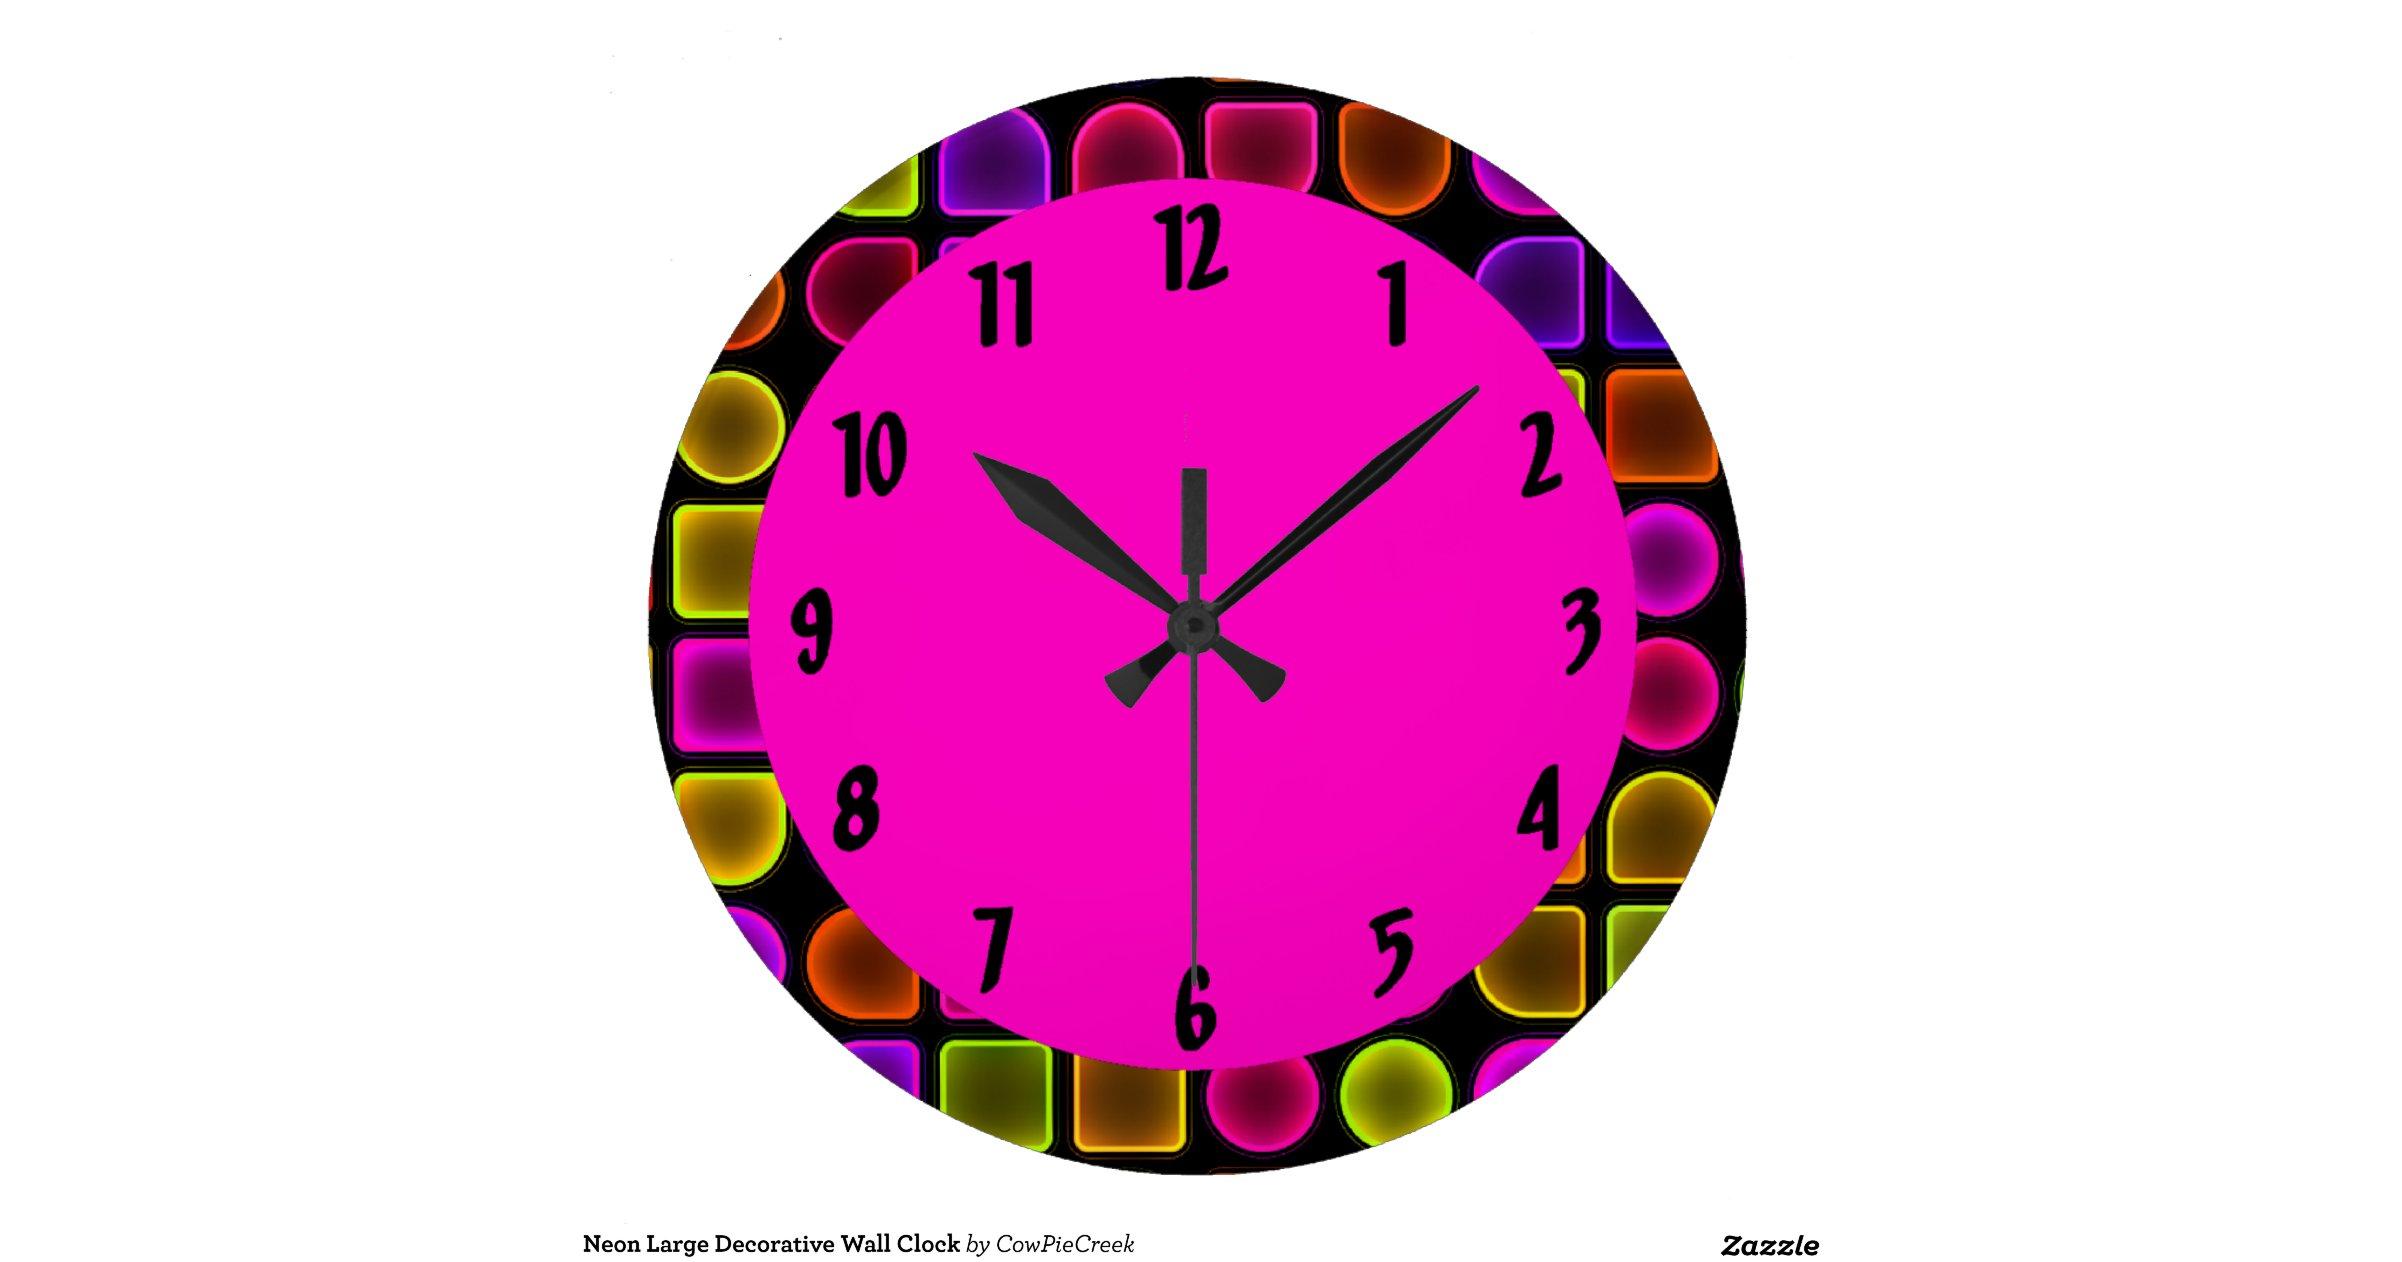 Neon Large Decorative Wall Clock Rcde20a3c456d49bfa4b3b7462c563a36 Fup13 8byv